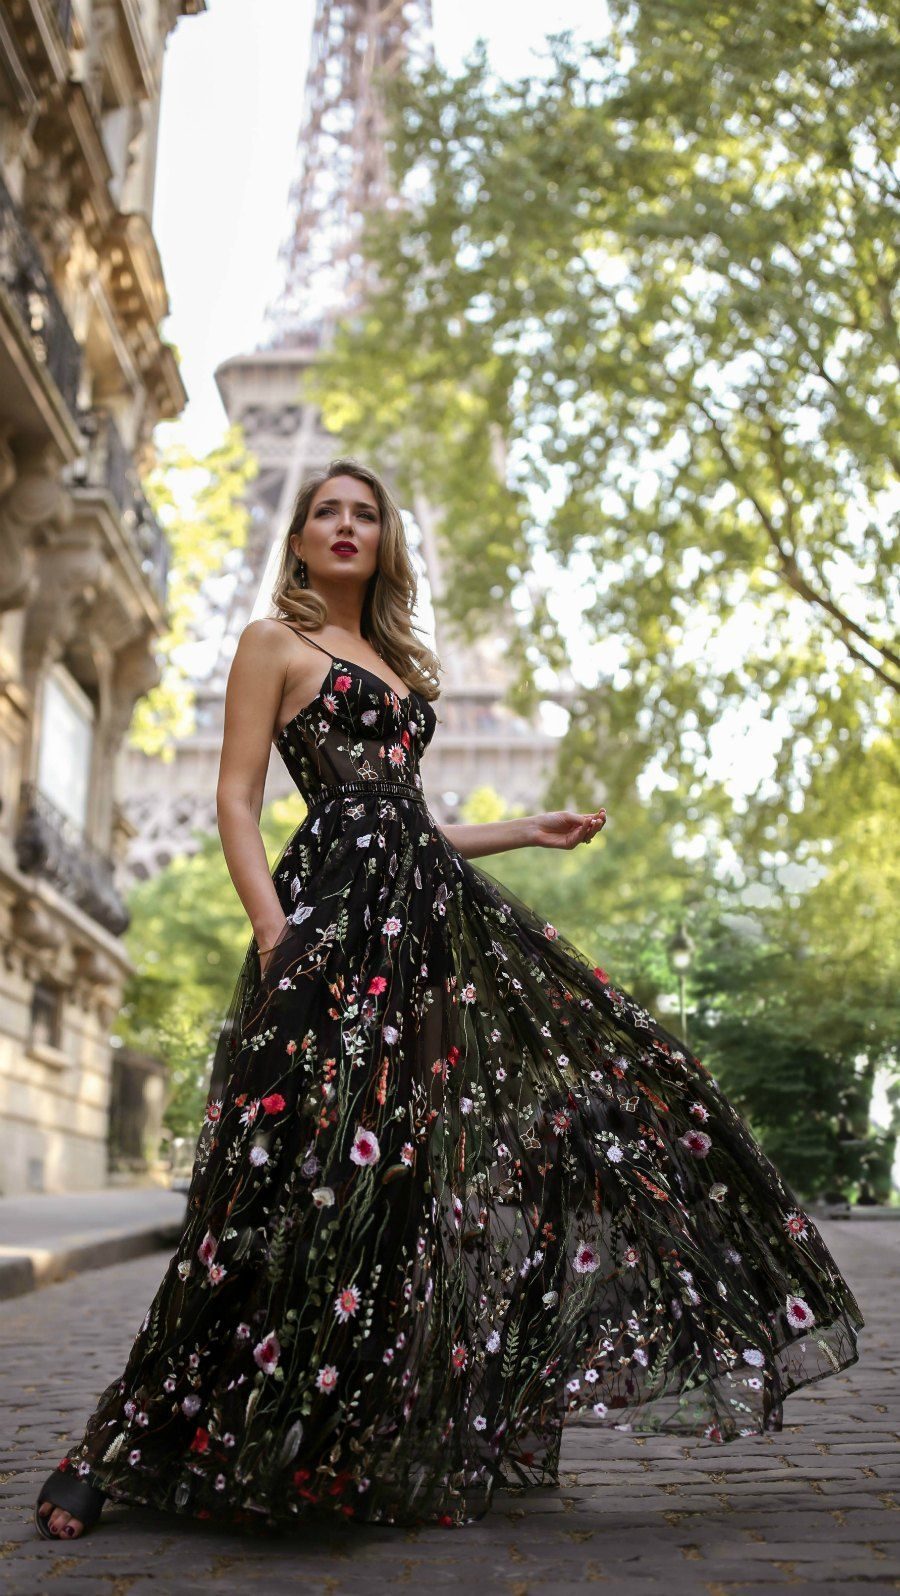 30 Dresses In 30 Days Day 12 Black Tie Wedding Long Black Floral Embellished Spaghetti Strap Dress With B Elegant Dresses Pretty Dresses Gorgeous Dresses [ 1596 x 900 Pixel ]